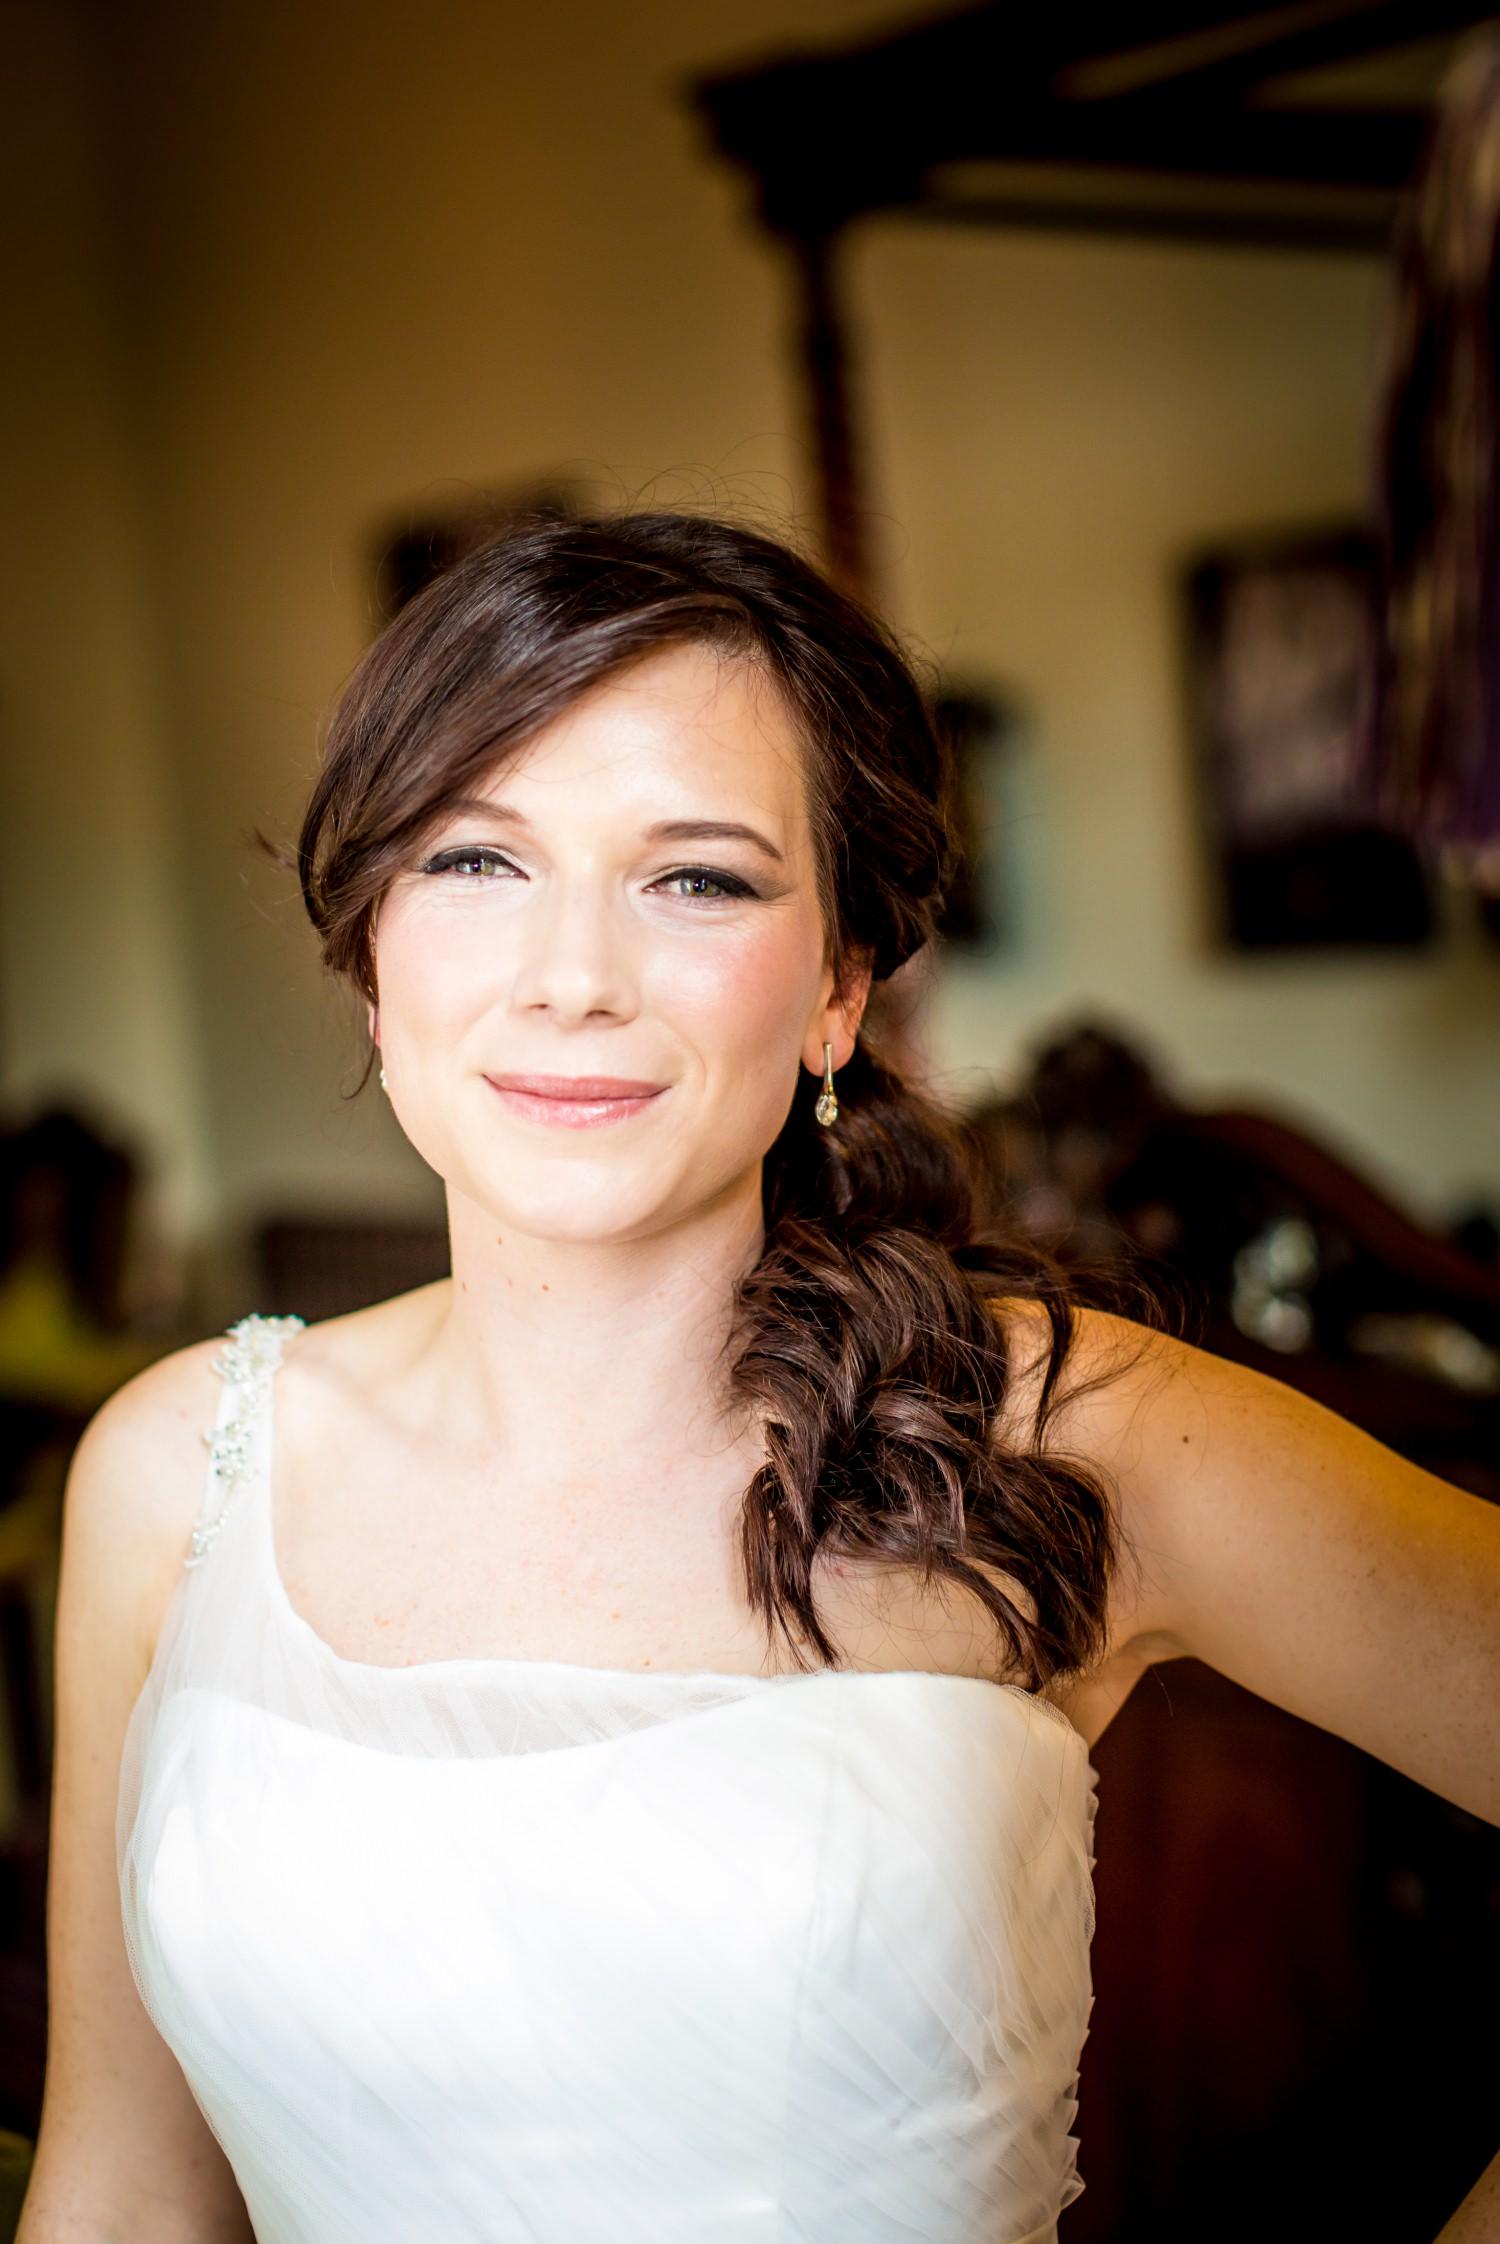 Wedding Photography portrait of bride at Peckforton Castle